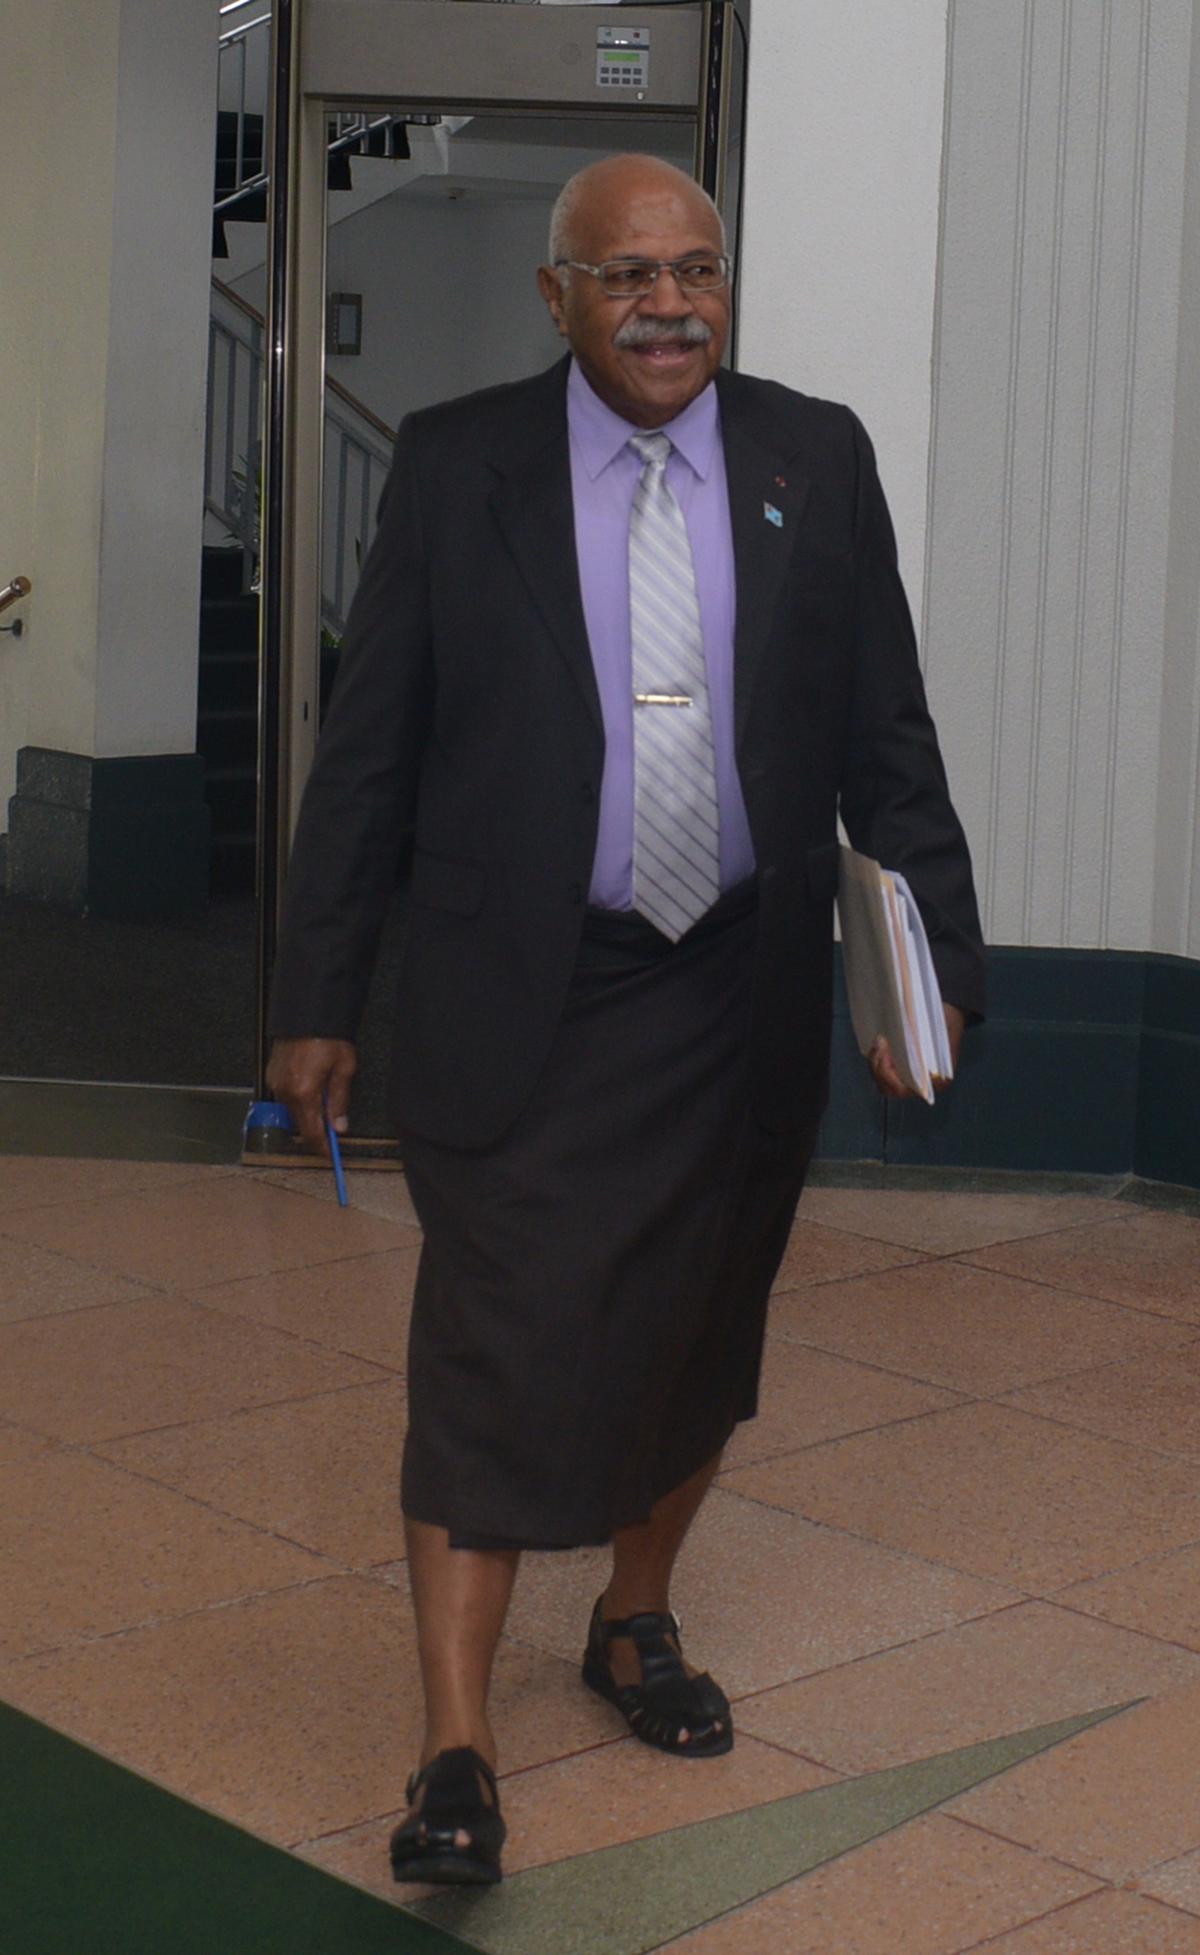 Opposition leader Sitiveni Rabuka outside the parliament house on February 11,2019.Photo:Simione Haravanua.